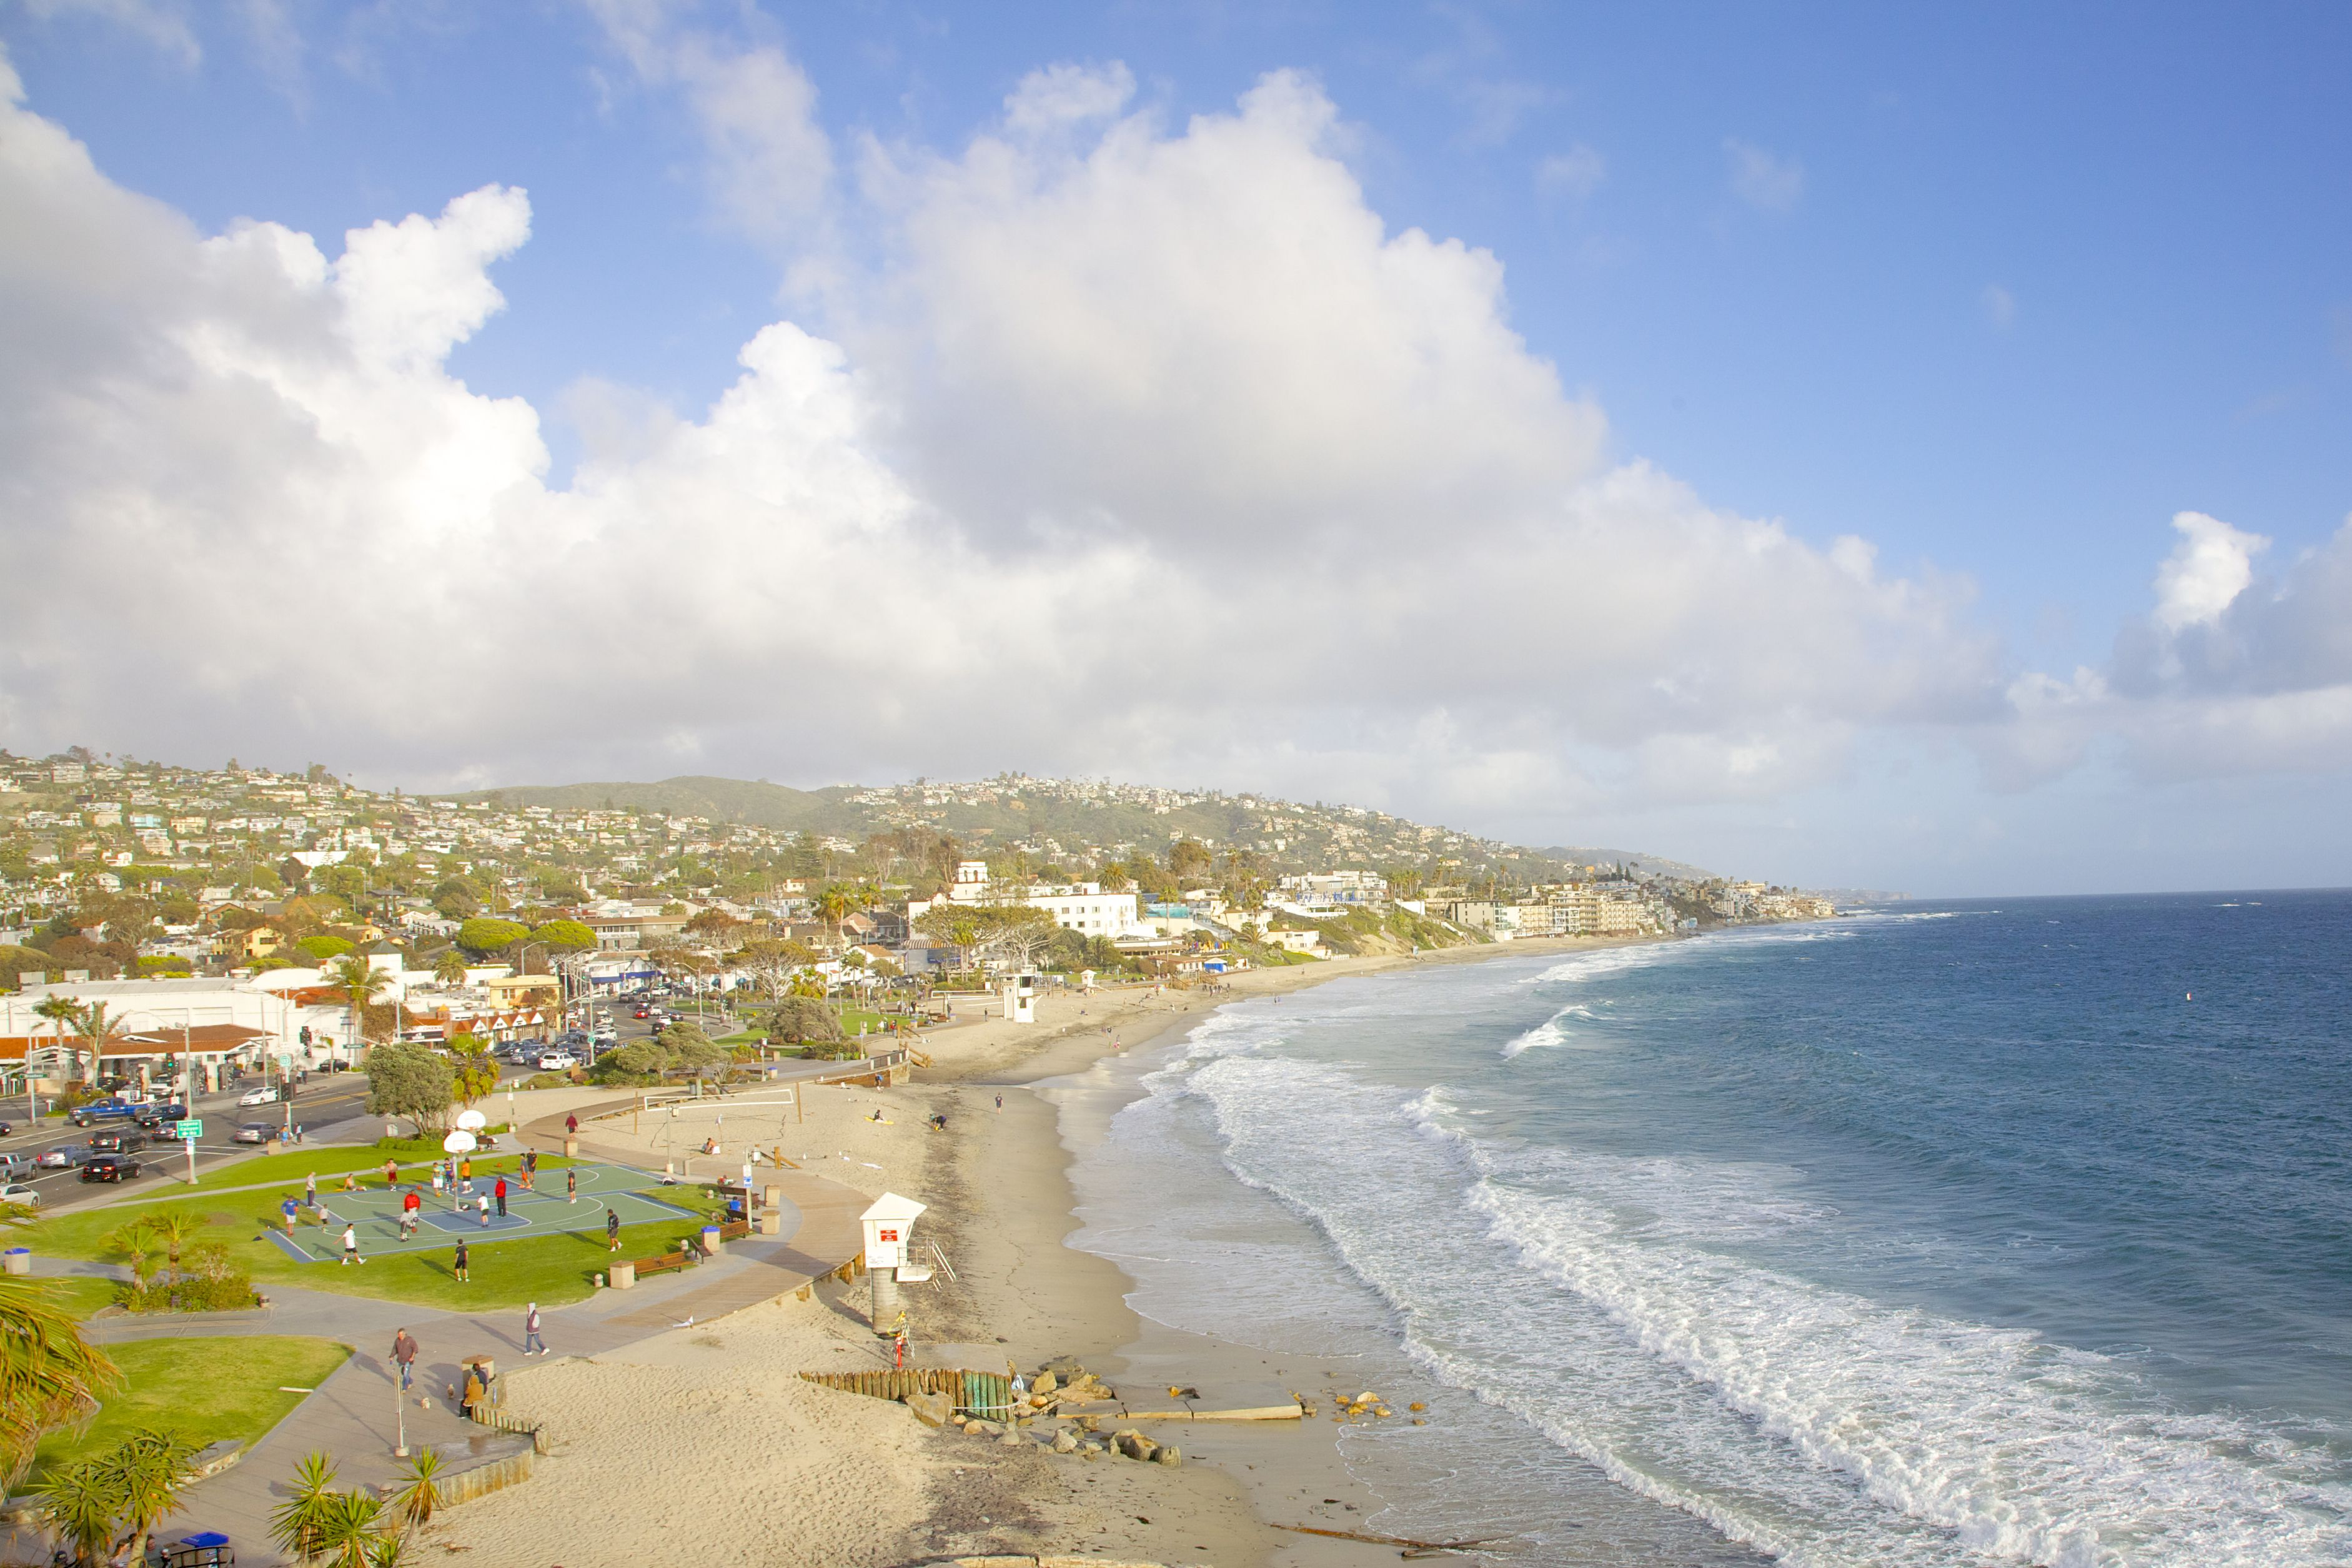 Océano Pacífico y Laguna Beach, California